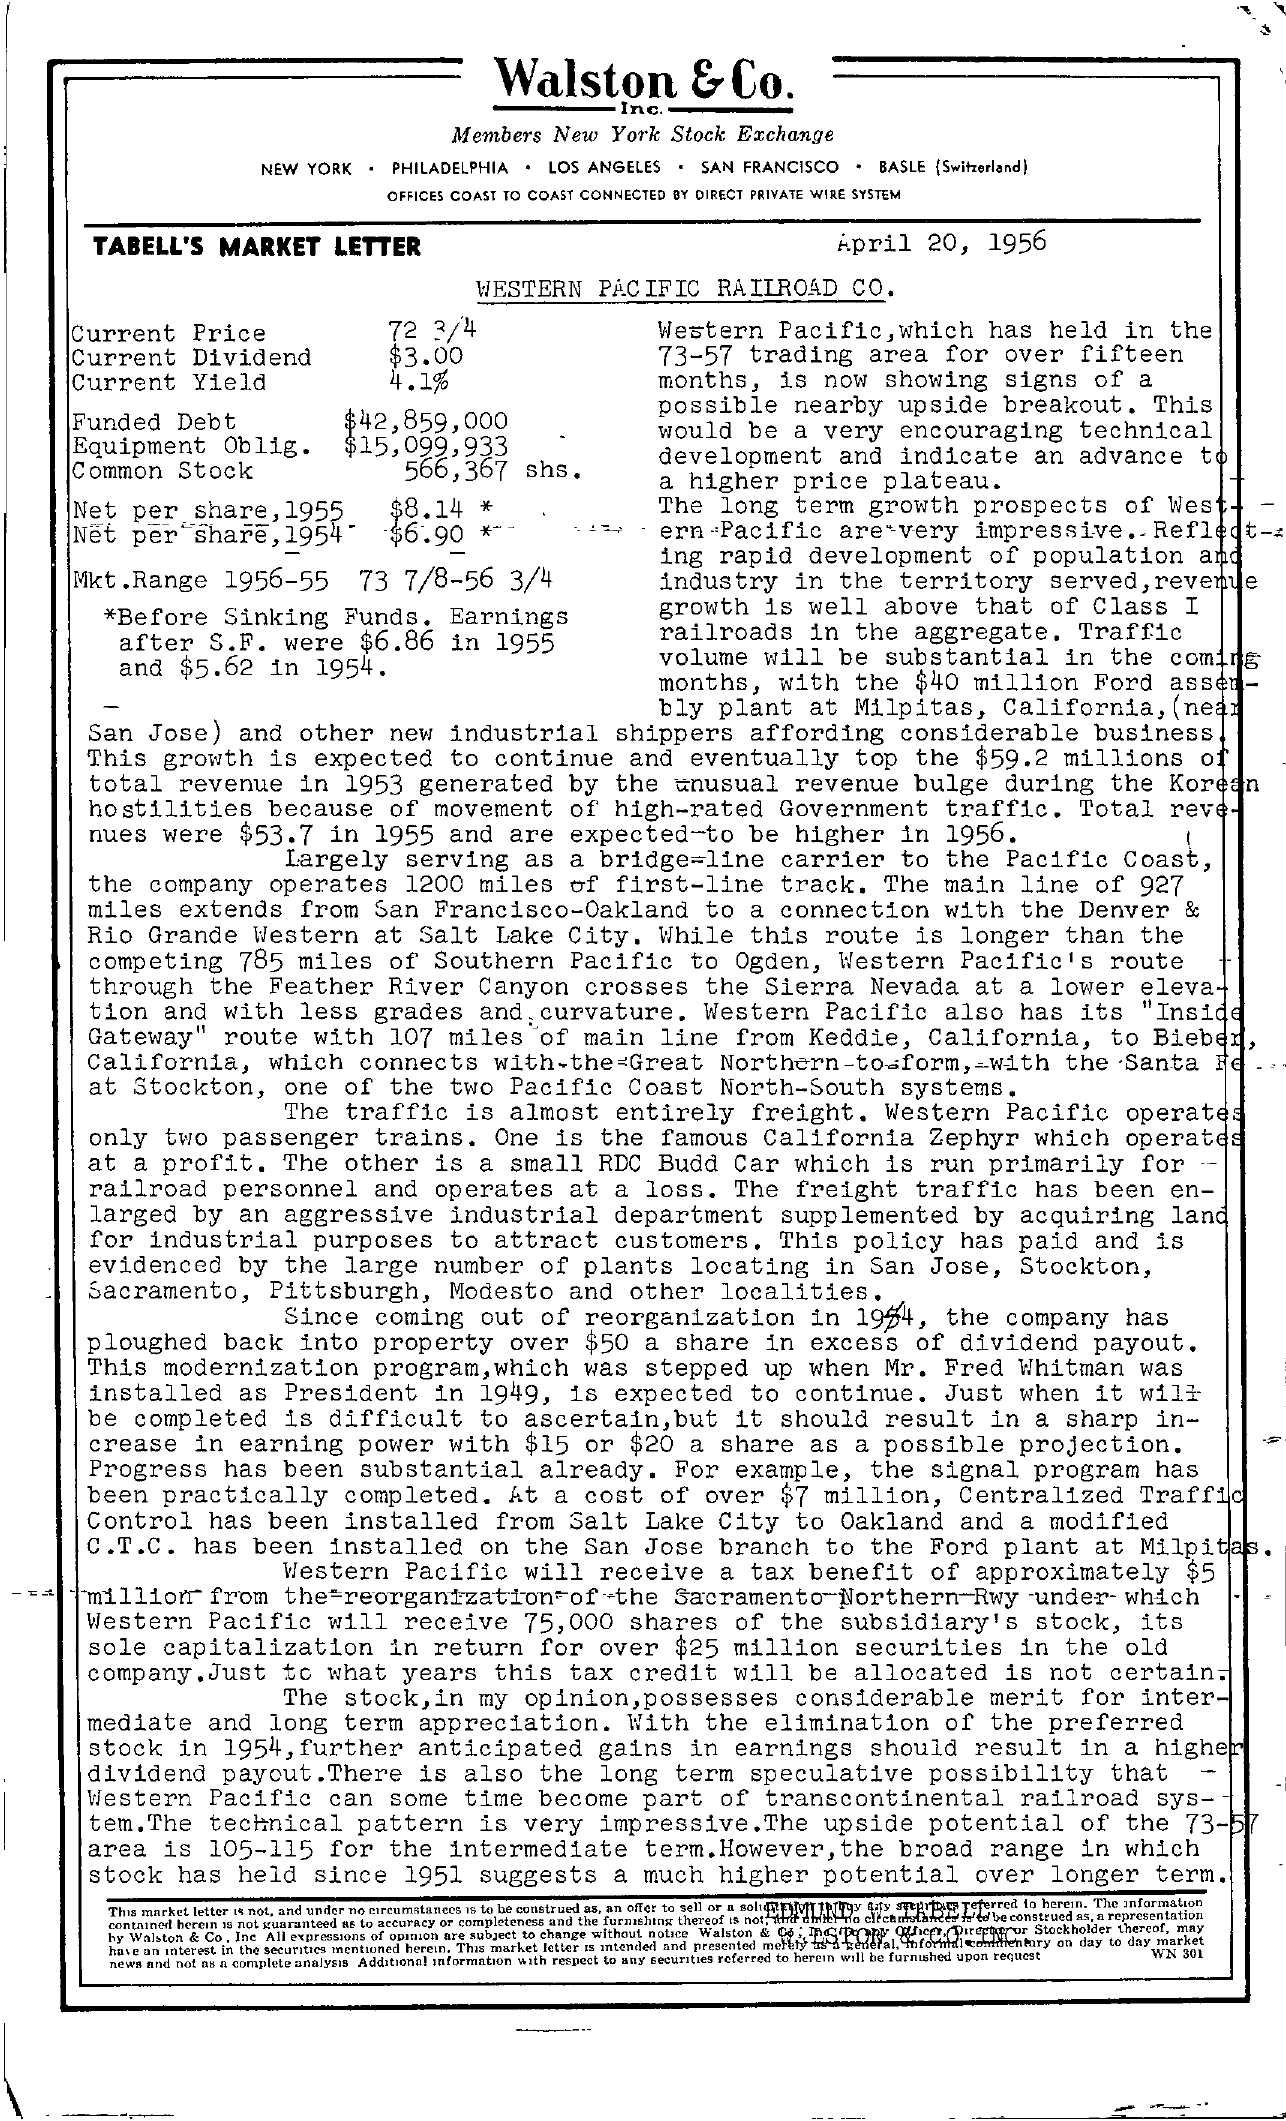 Tabell's Market Letter - April 20, 1956